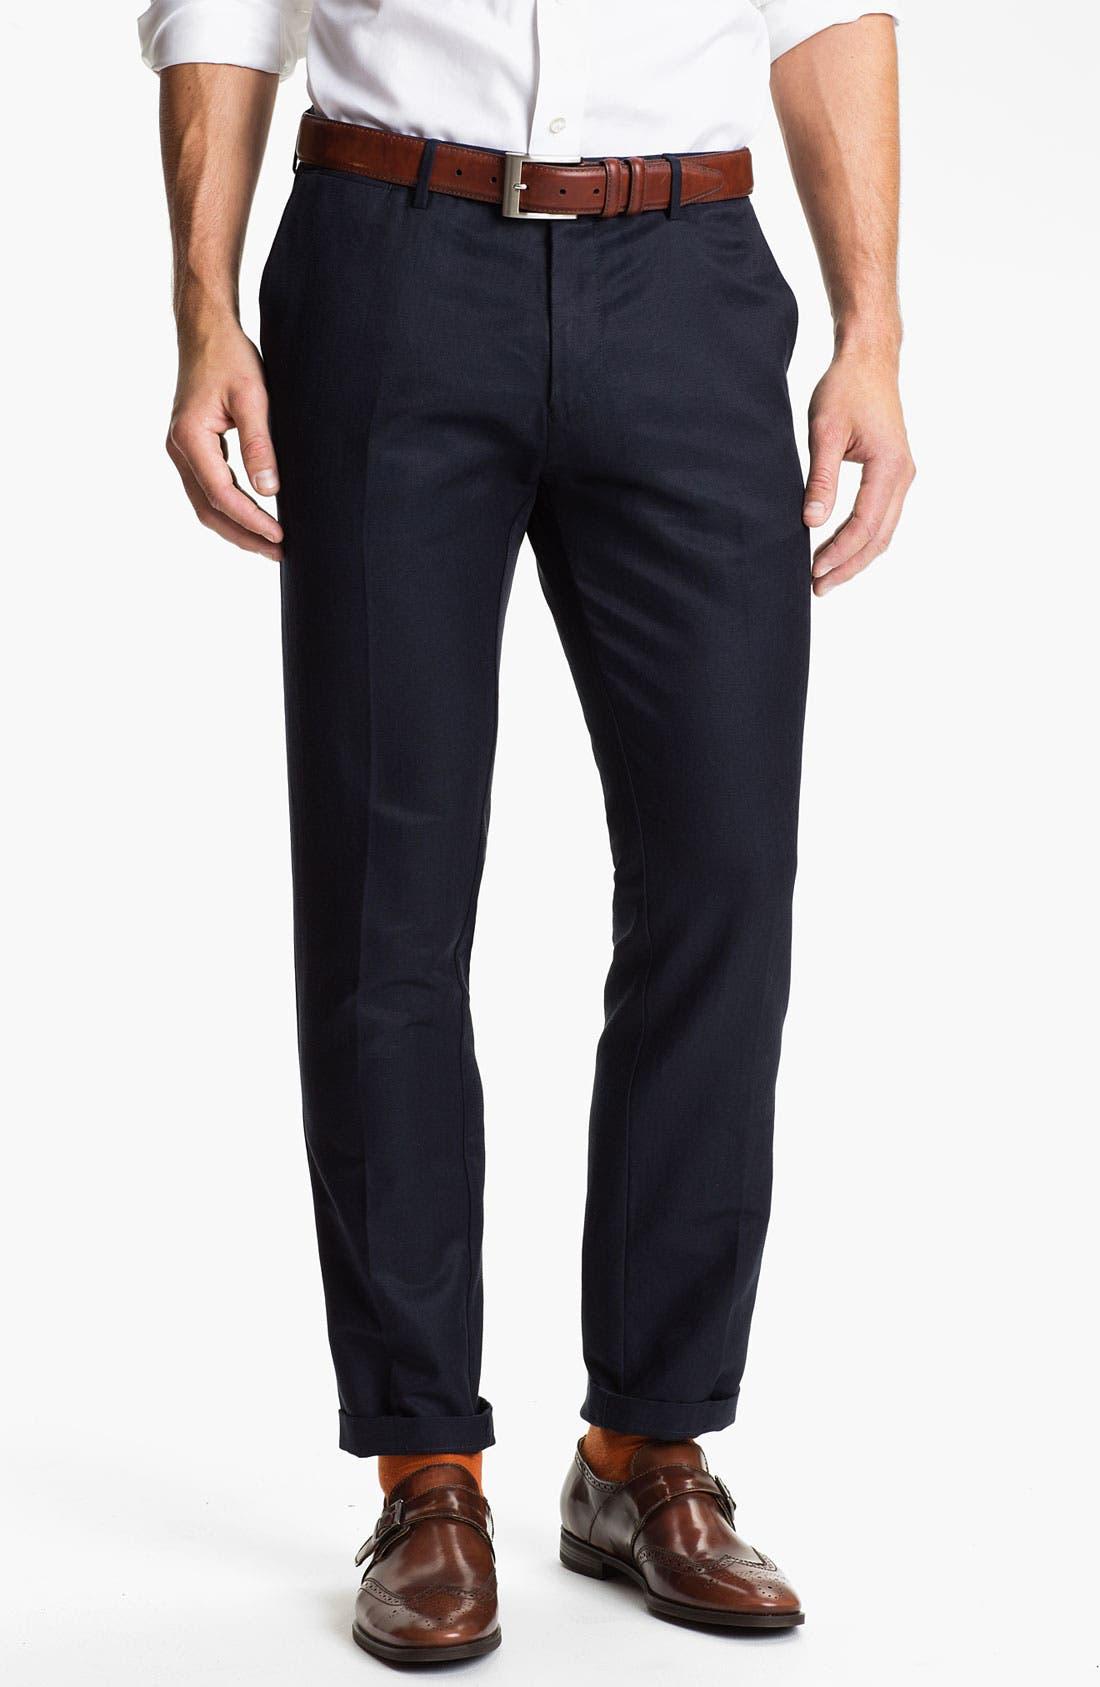 Alternate Image 1 Selected - BOSS Black 'Caleb' Flat Front Silk Blend Pants (Online Only)